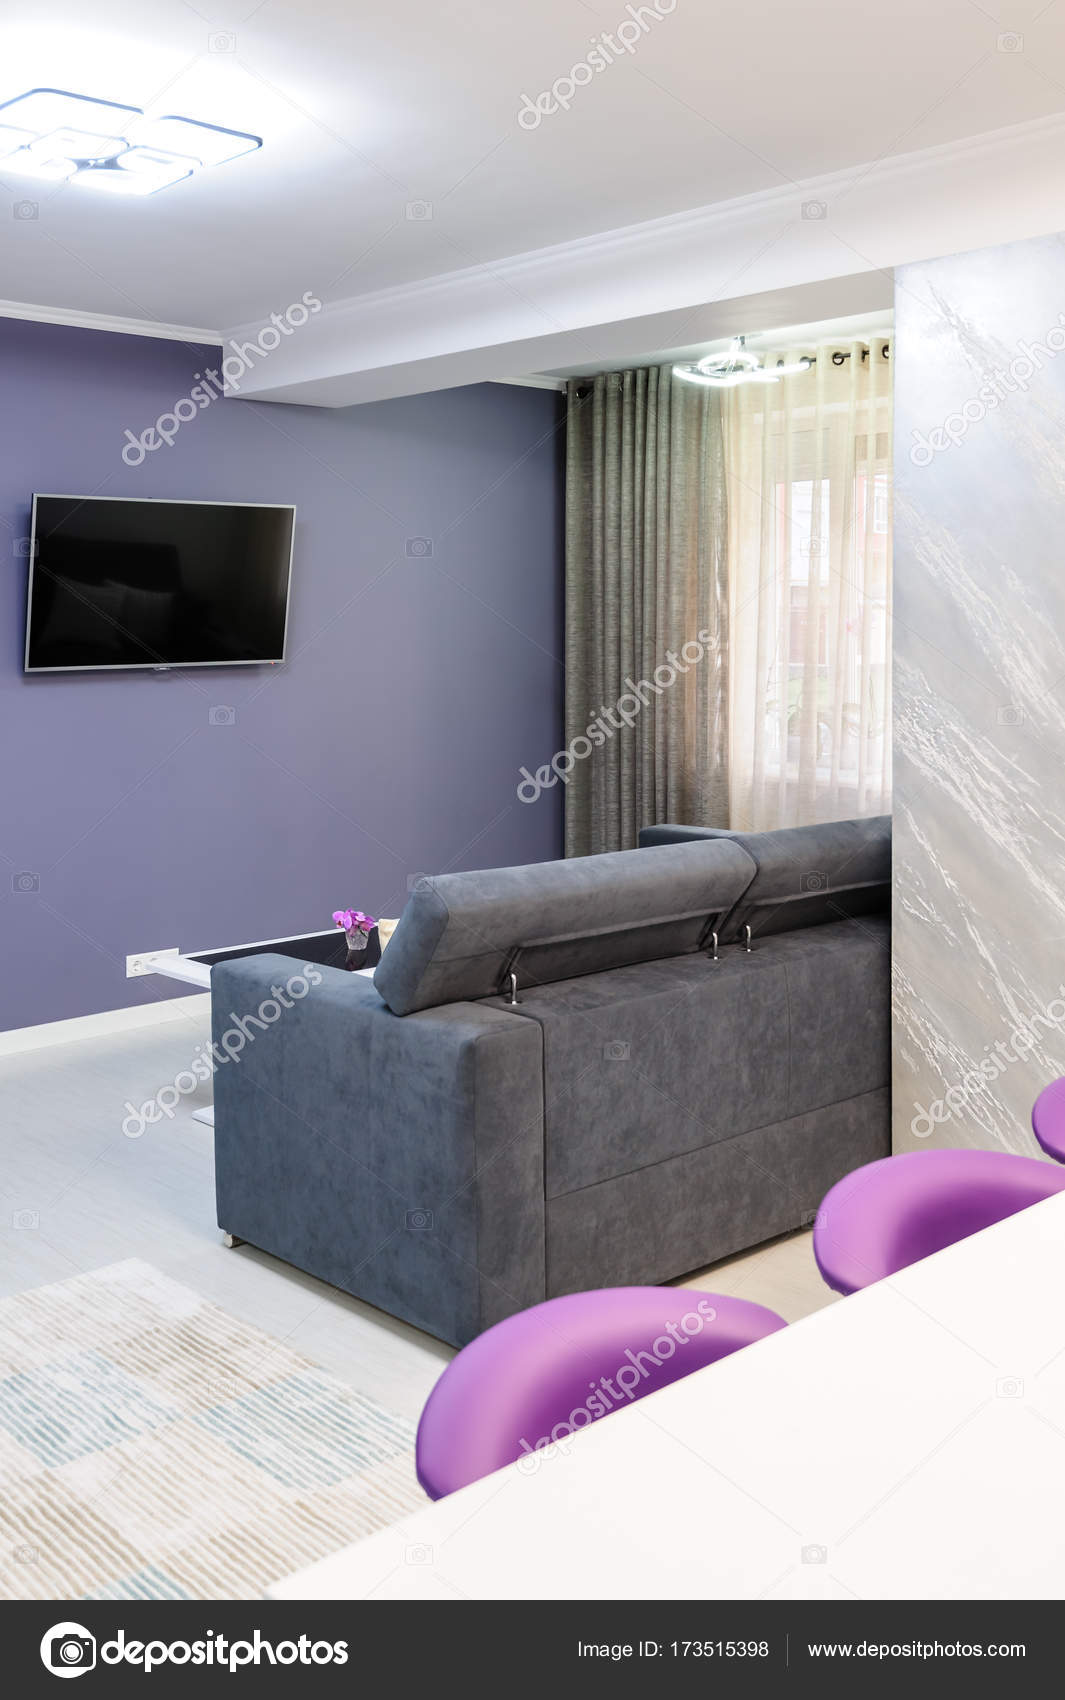 Moderne Witte Eettafel.Witte Eettafel In Moderne Keuken Stockfoto C Starush